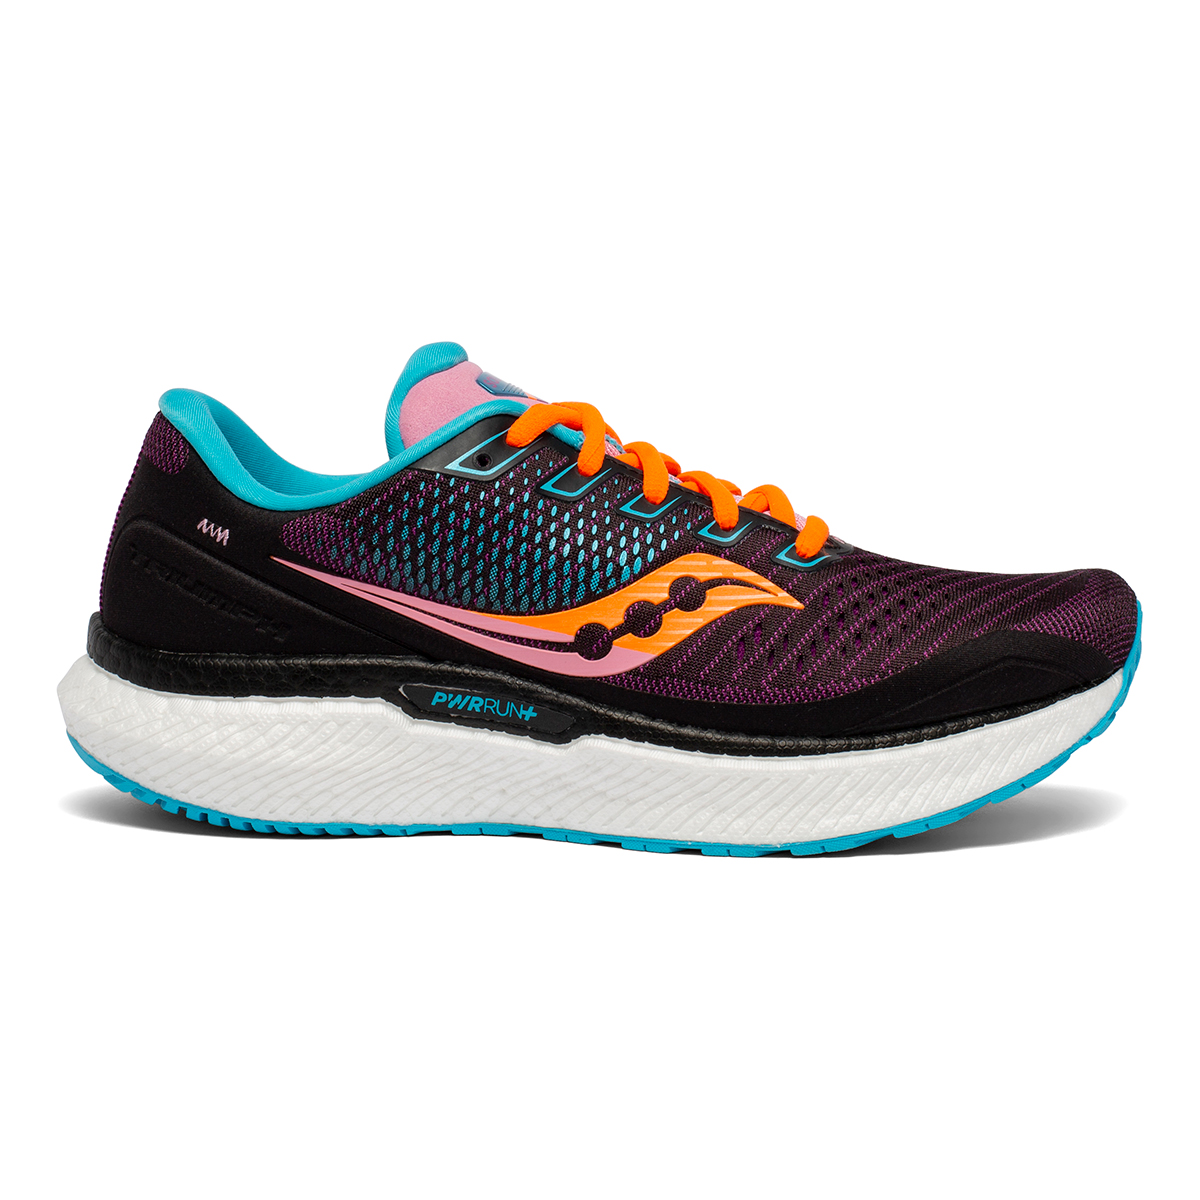 Women's Saucony Triumph 18 Running Shoe - Color: Future/Black - Size: 5 - Width: Regular, Future/Black, large, image 1